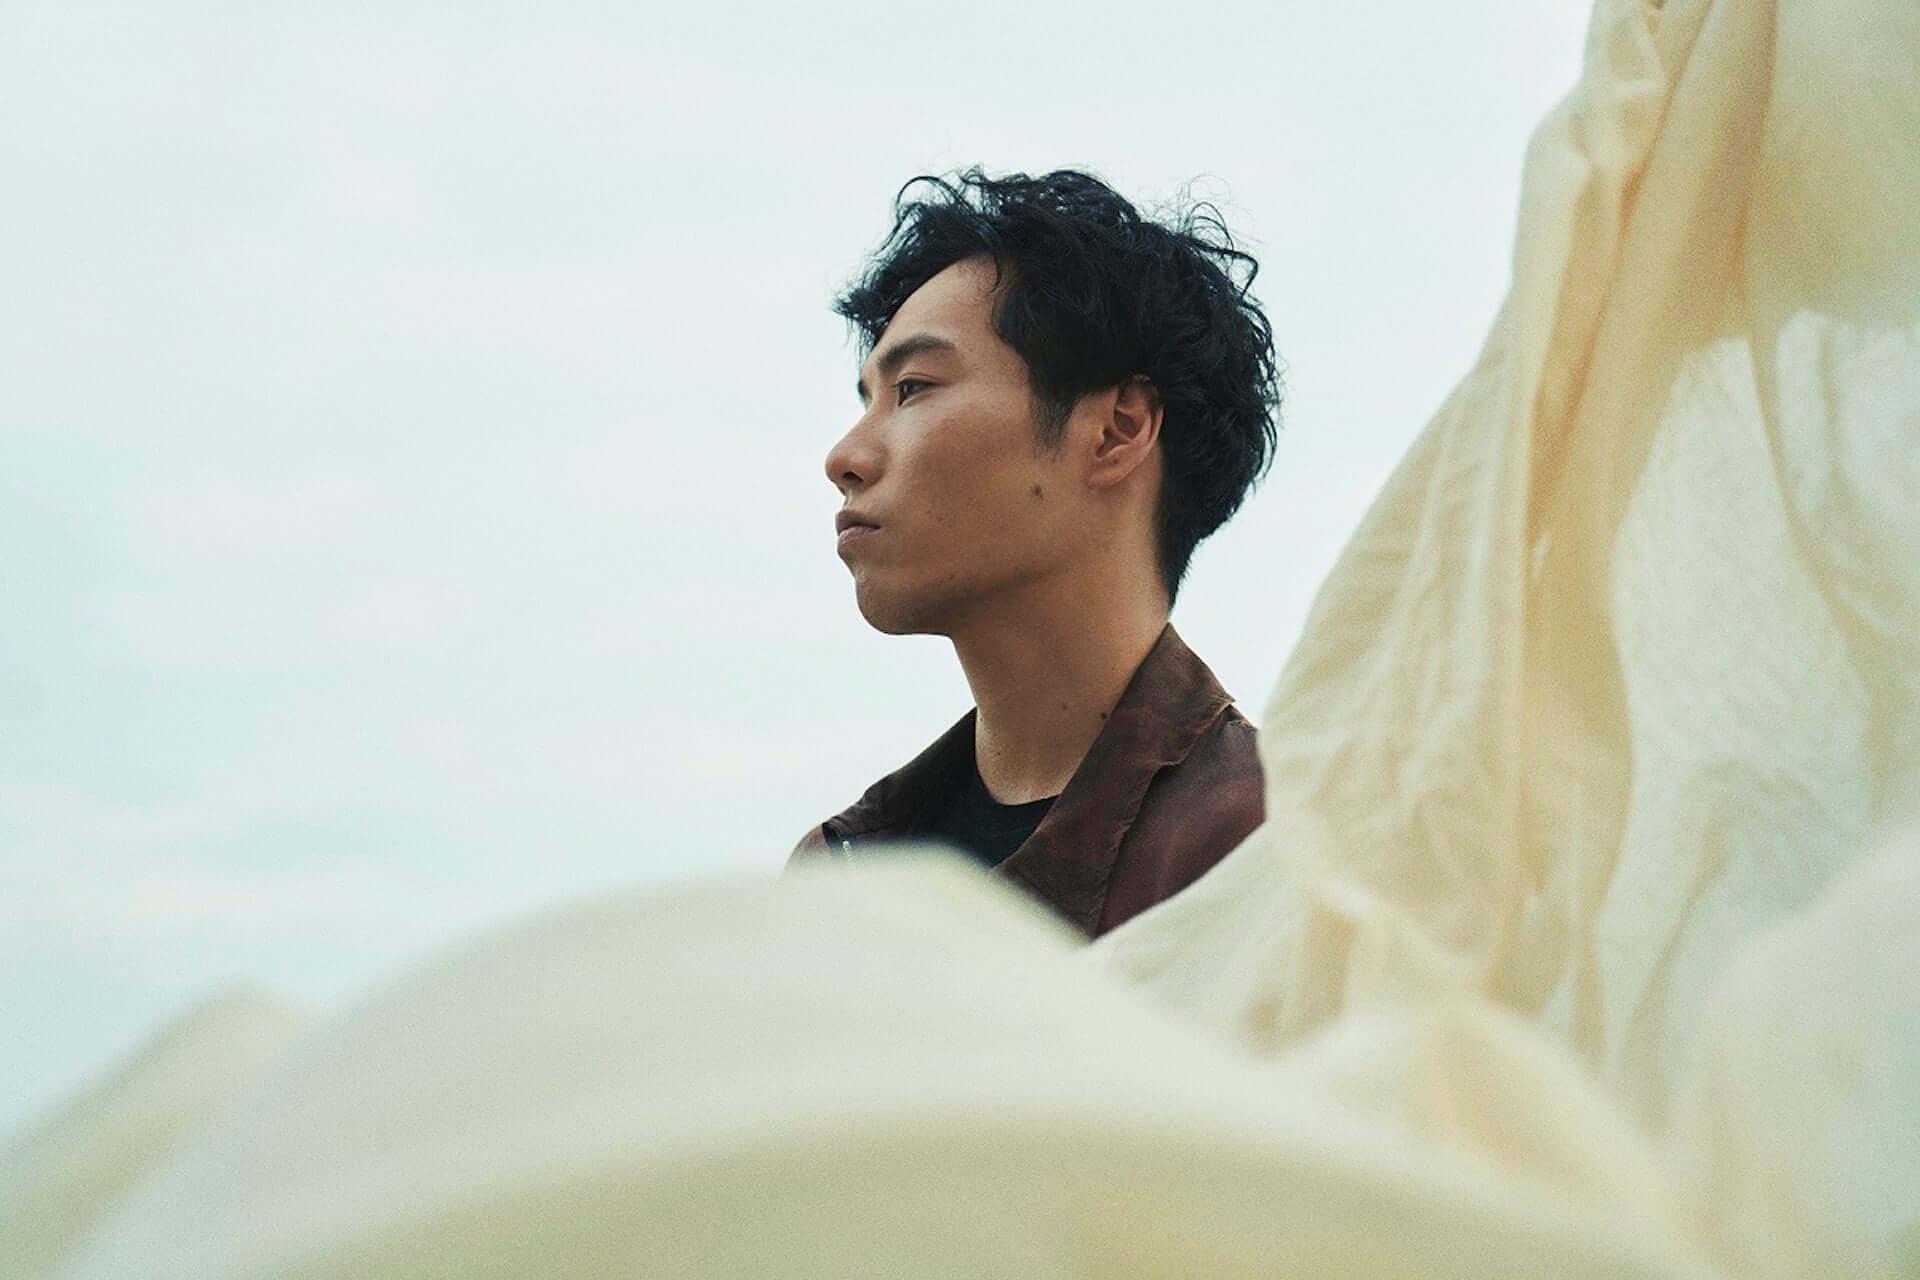 Ryohuの1stアルバム『DEBUT』リリース記念ライブにAAAMYYY、TENDRE、Shin Sakiuraが出演決定!フリーチケットは申し込み受付中 music201120_ryohu_3-1920x1280